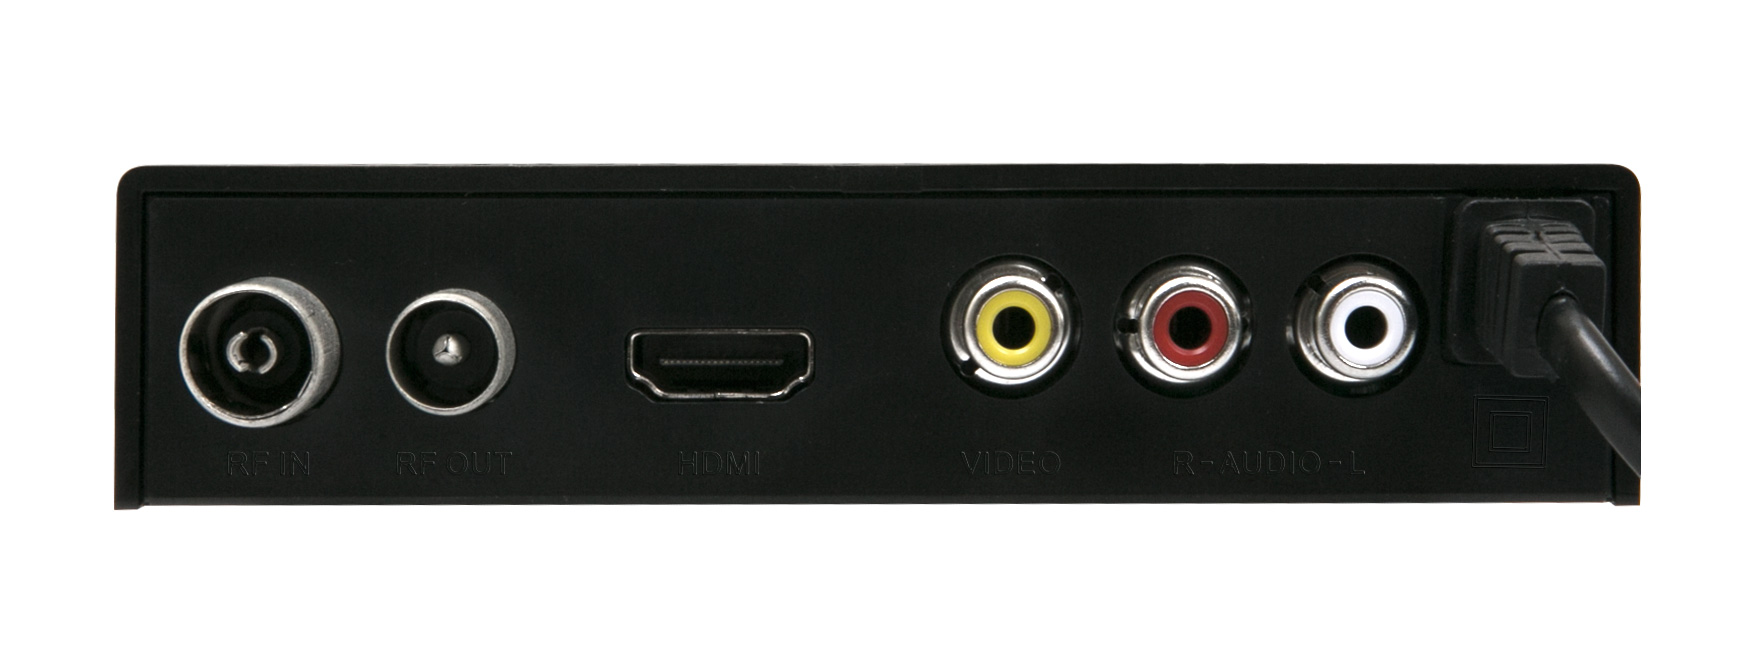 sdt8300q-rear-panel